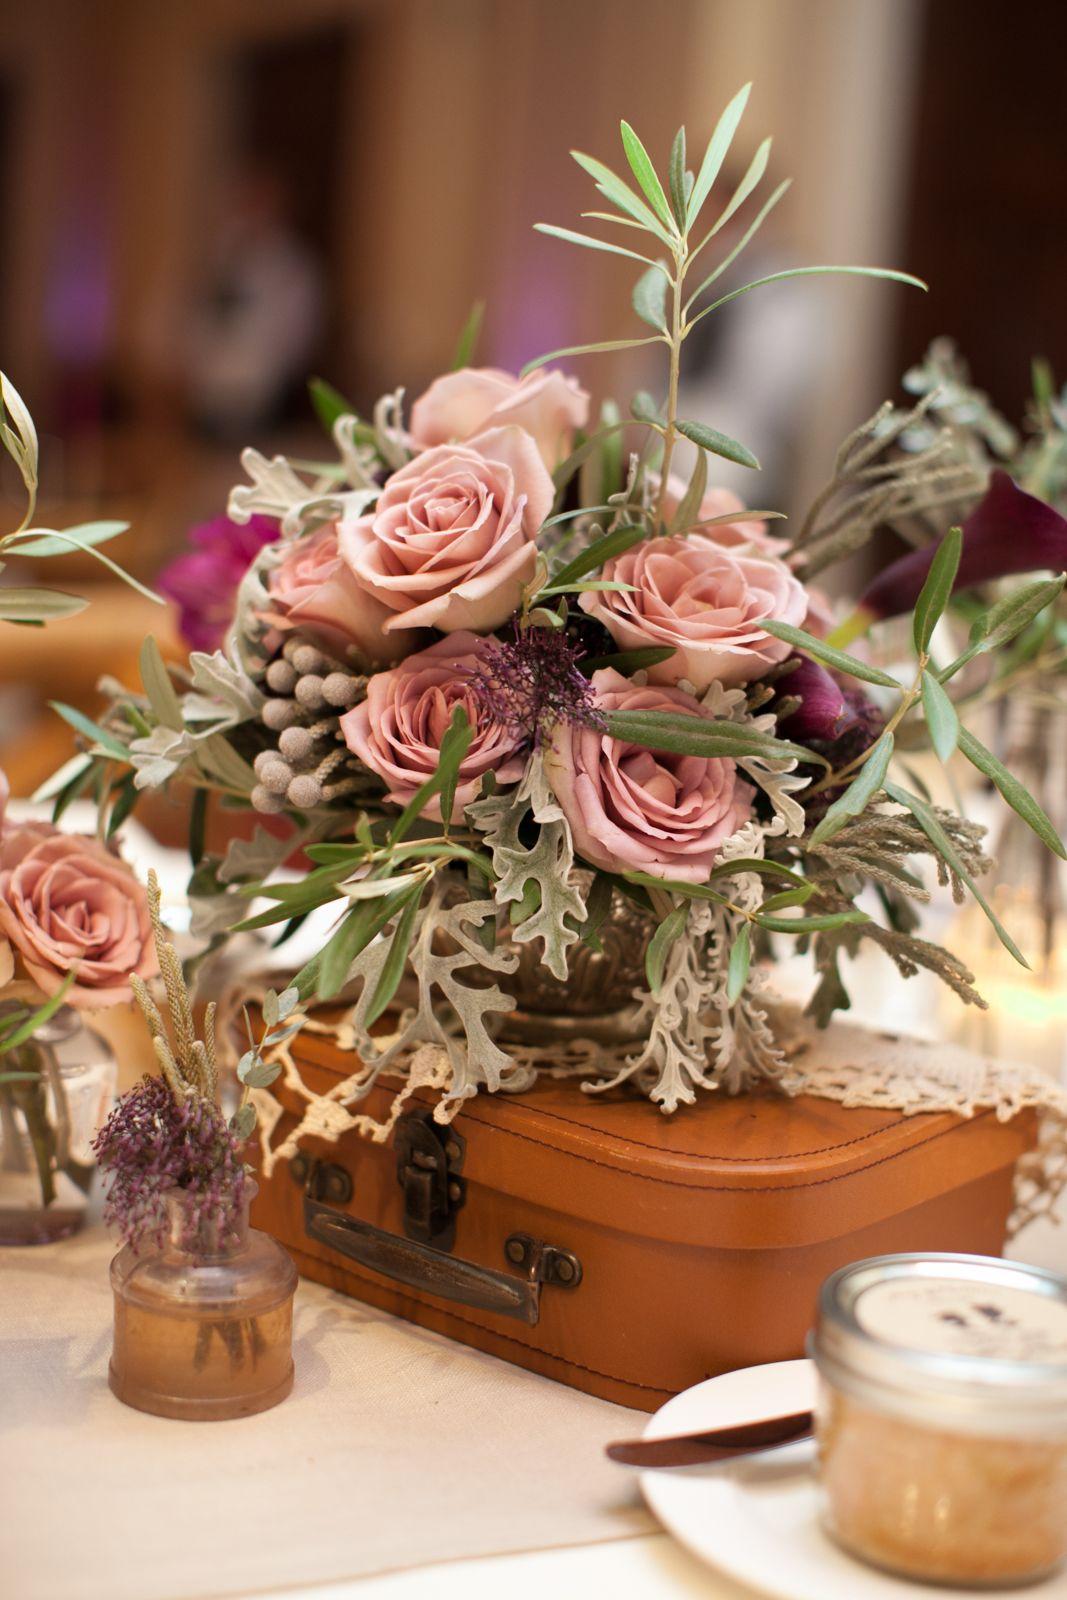 #romantic pinks and earthy sage… some of the best combinations for #vintage #wedding arrangements! #crosbyandjon #weddingdesign. Mibelle photography